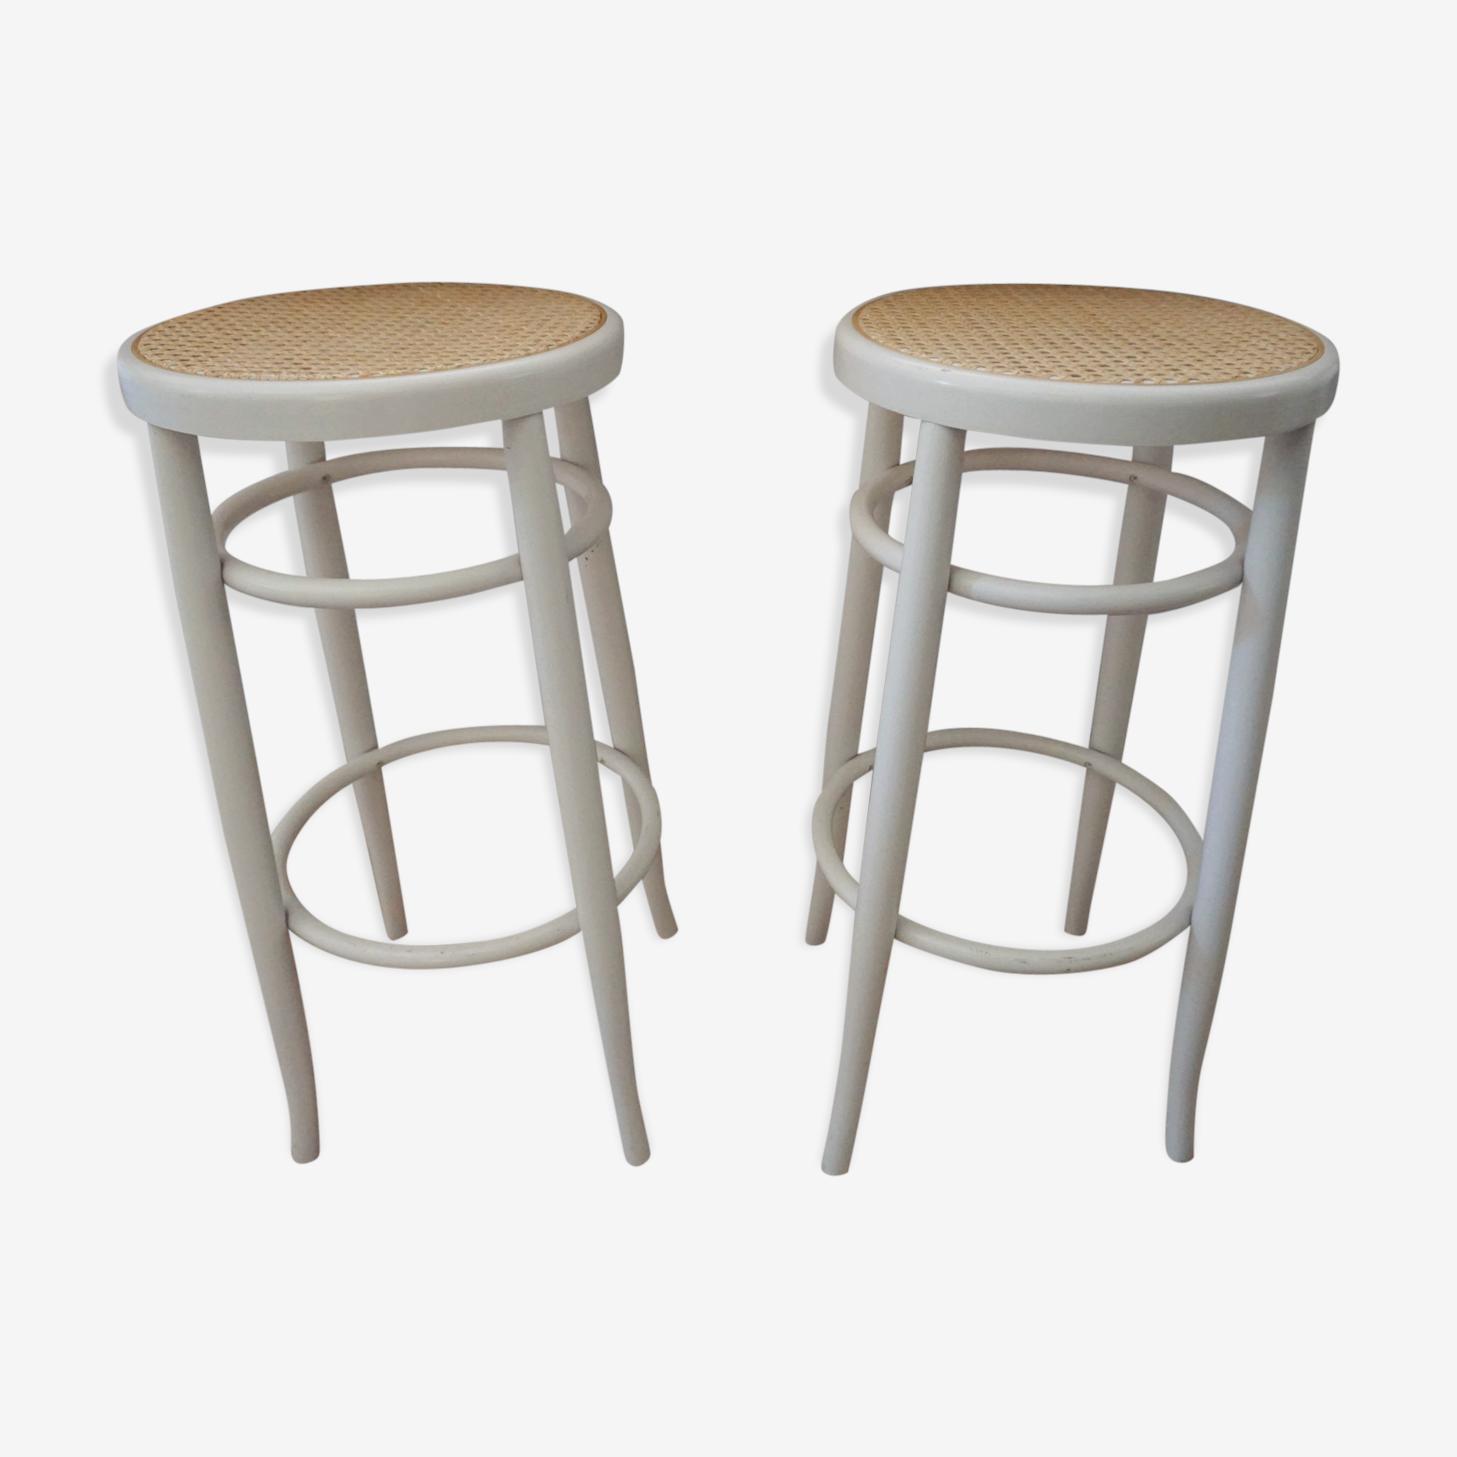 Set of 2 stools